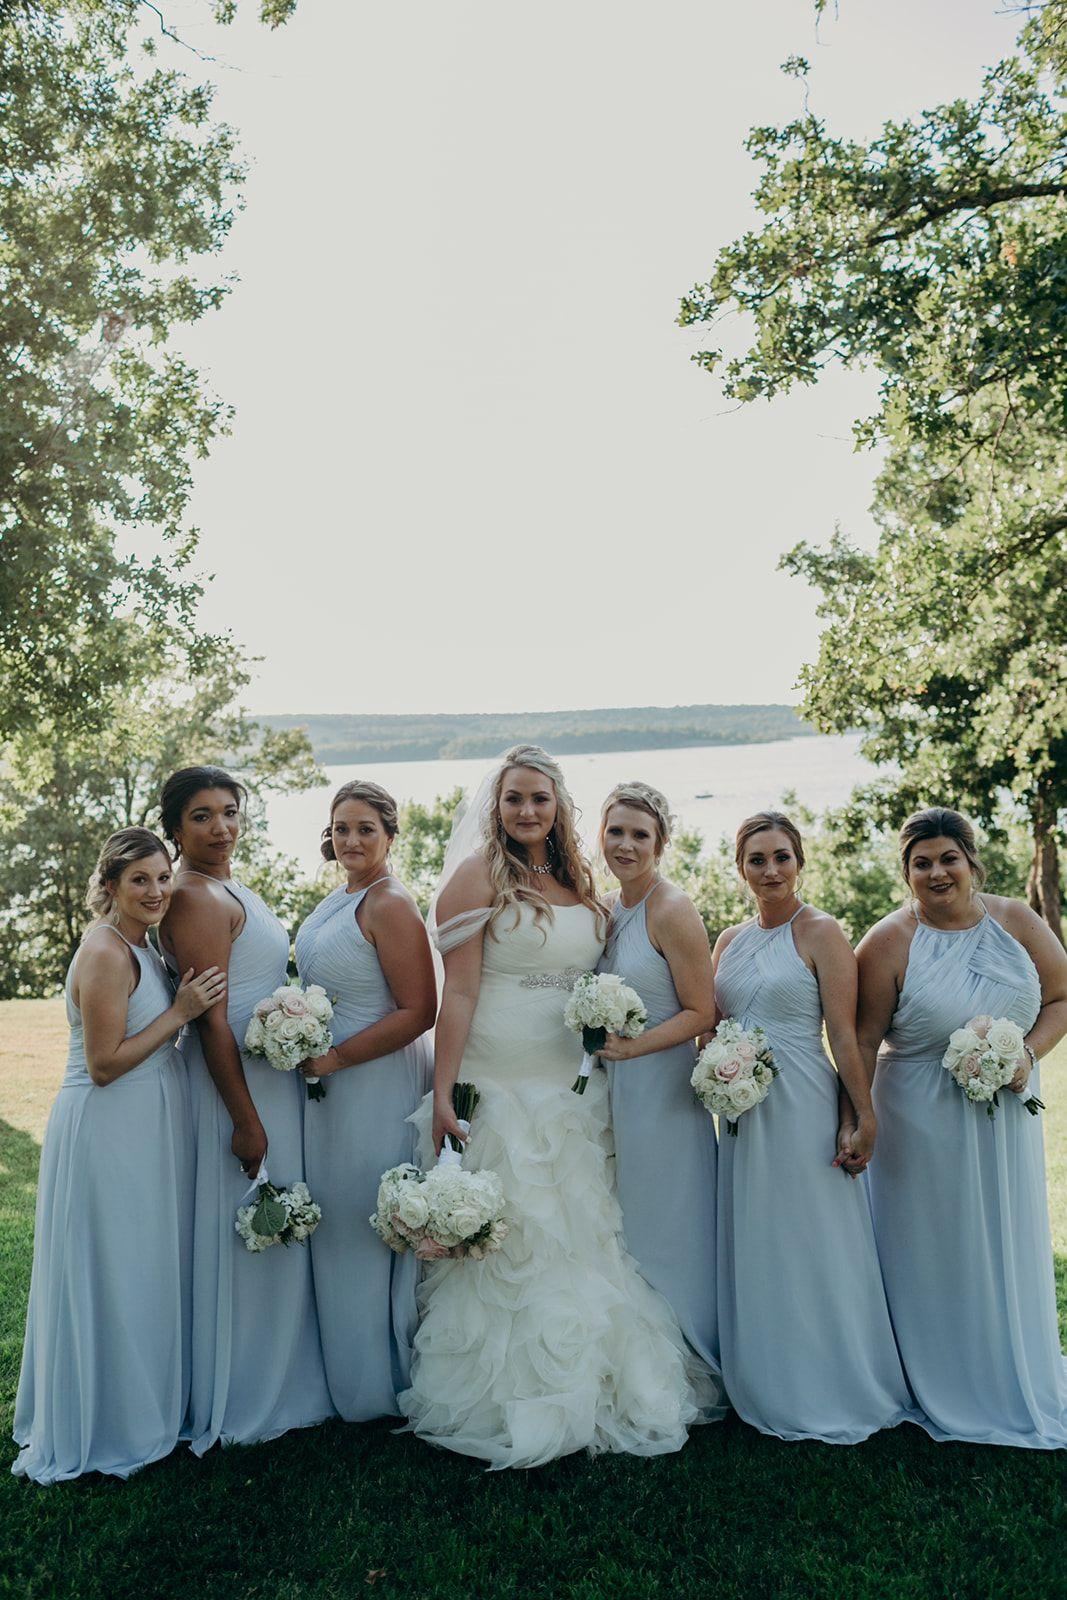 Long Country Blue Bridesmaid Dresses Modern Rustic Bridesmaid